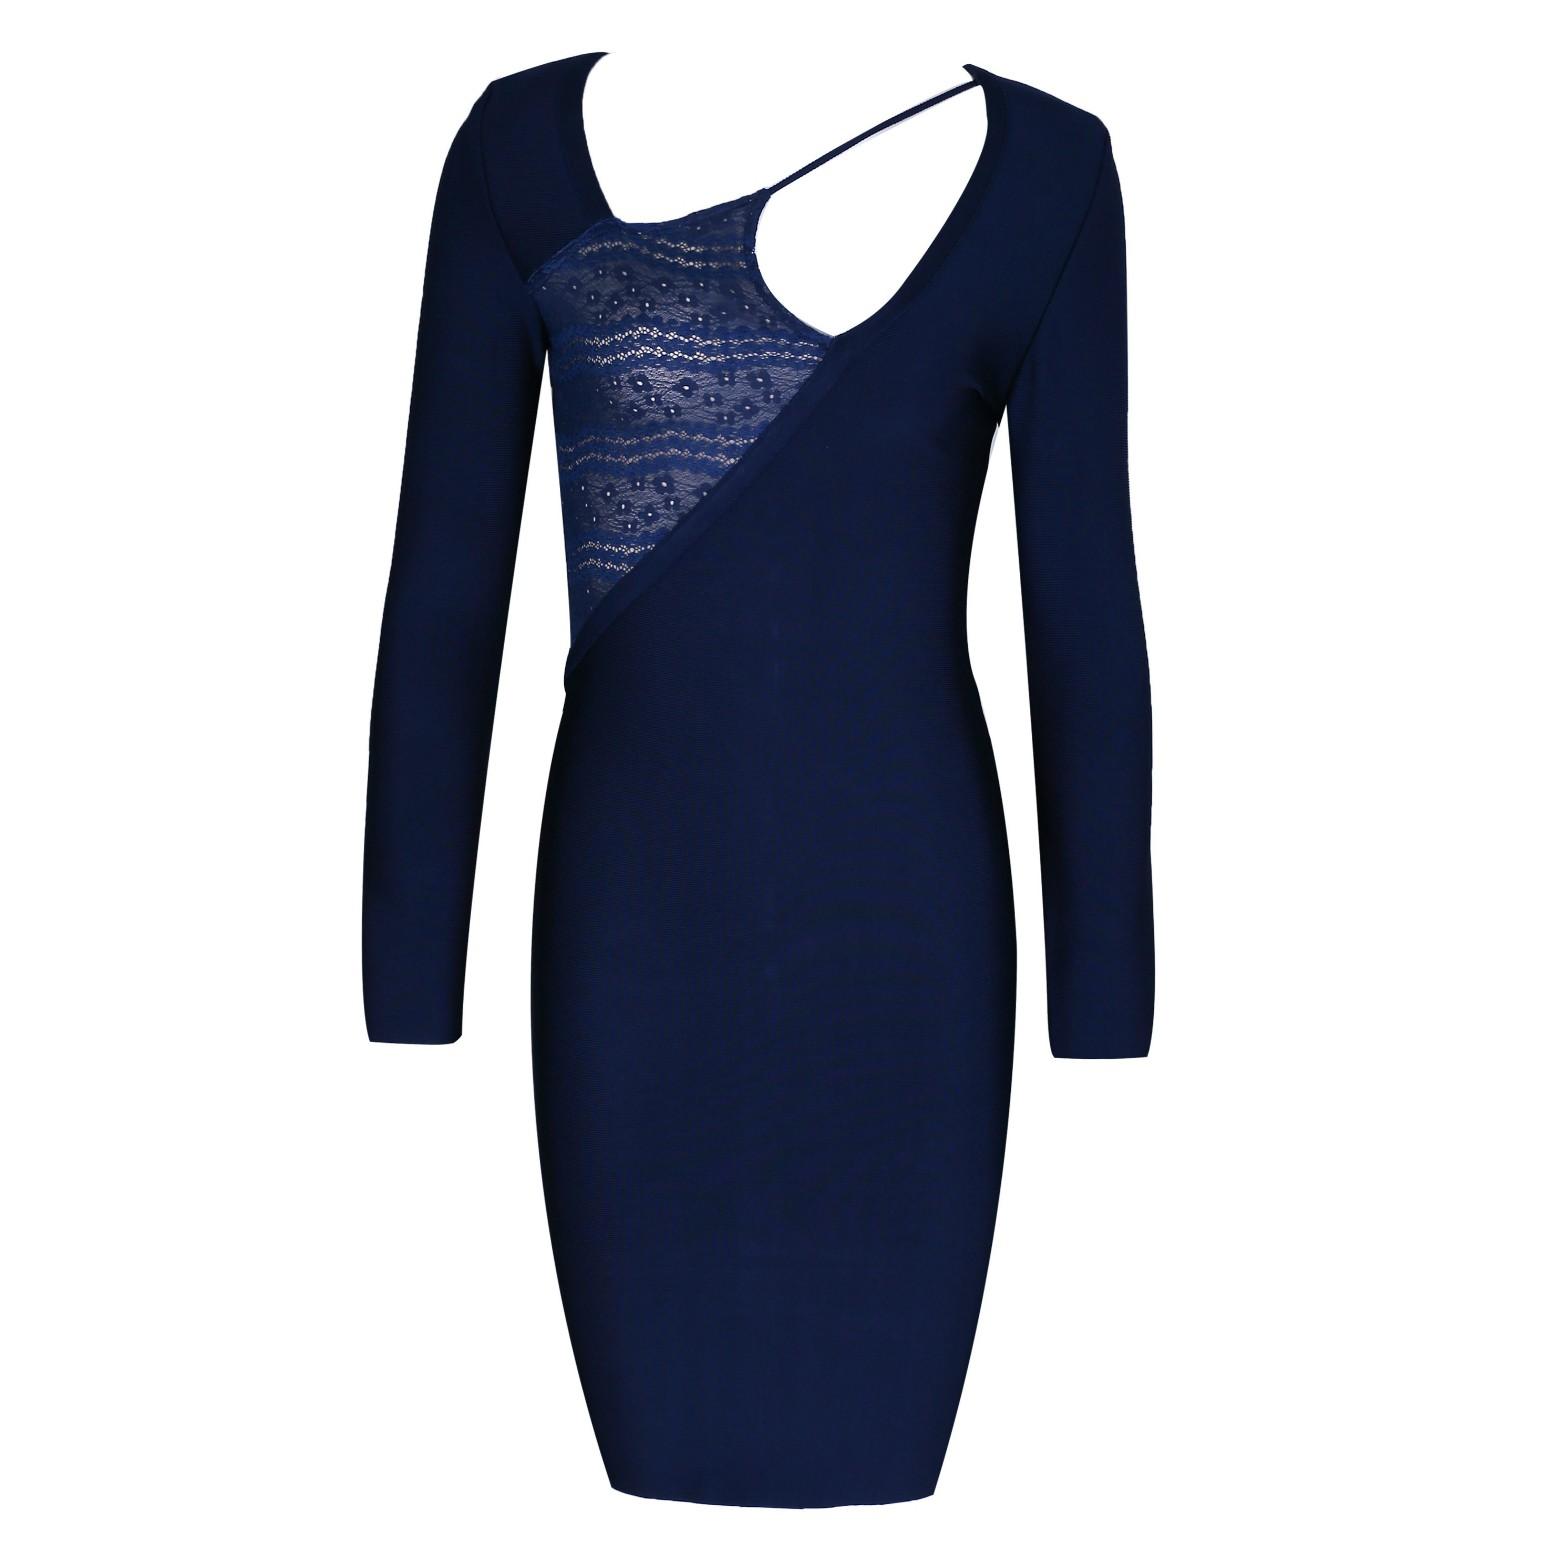 Blue Round Neck Long Sleeve Above Knee Lace Decorated Sexy Bandage Dress HI920-Blue